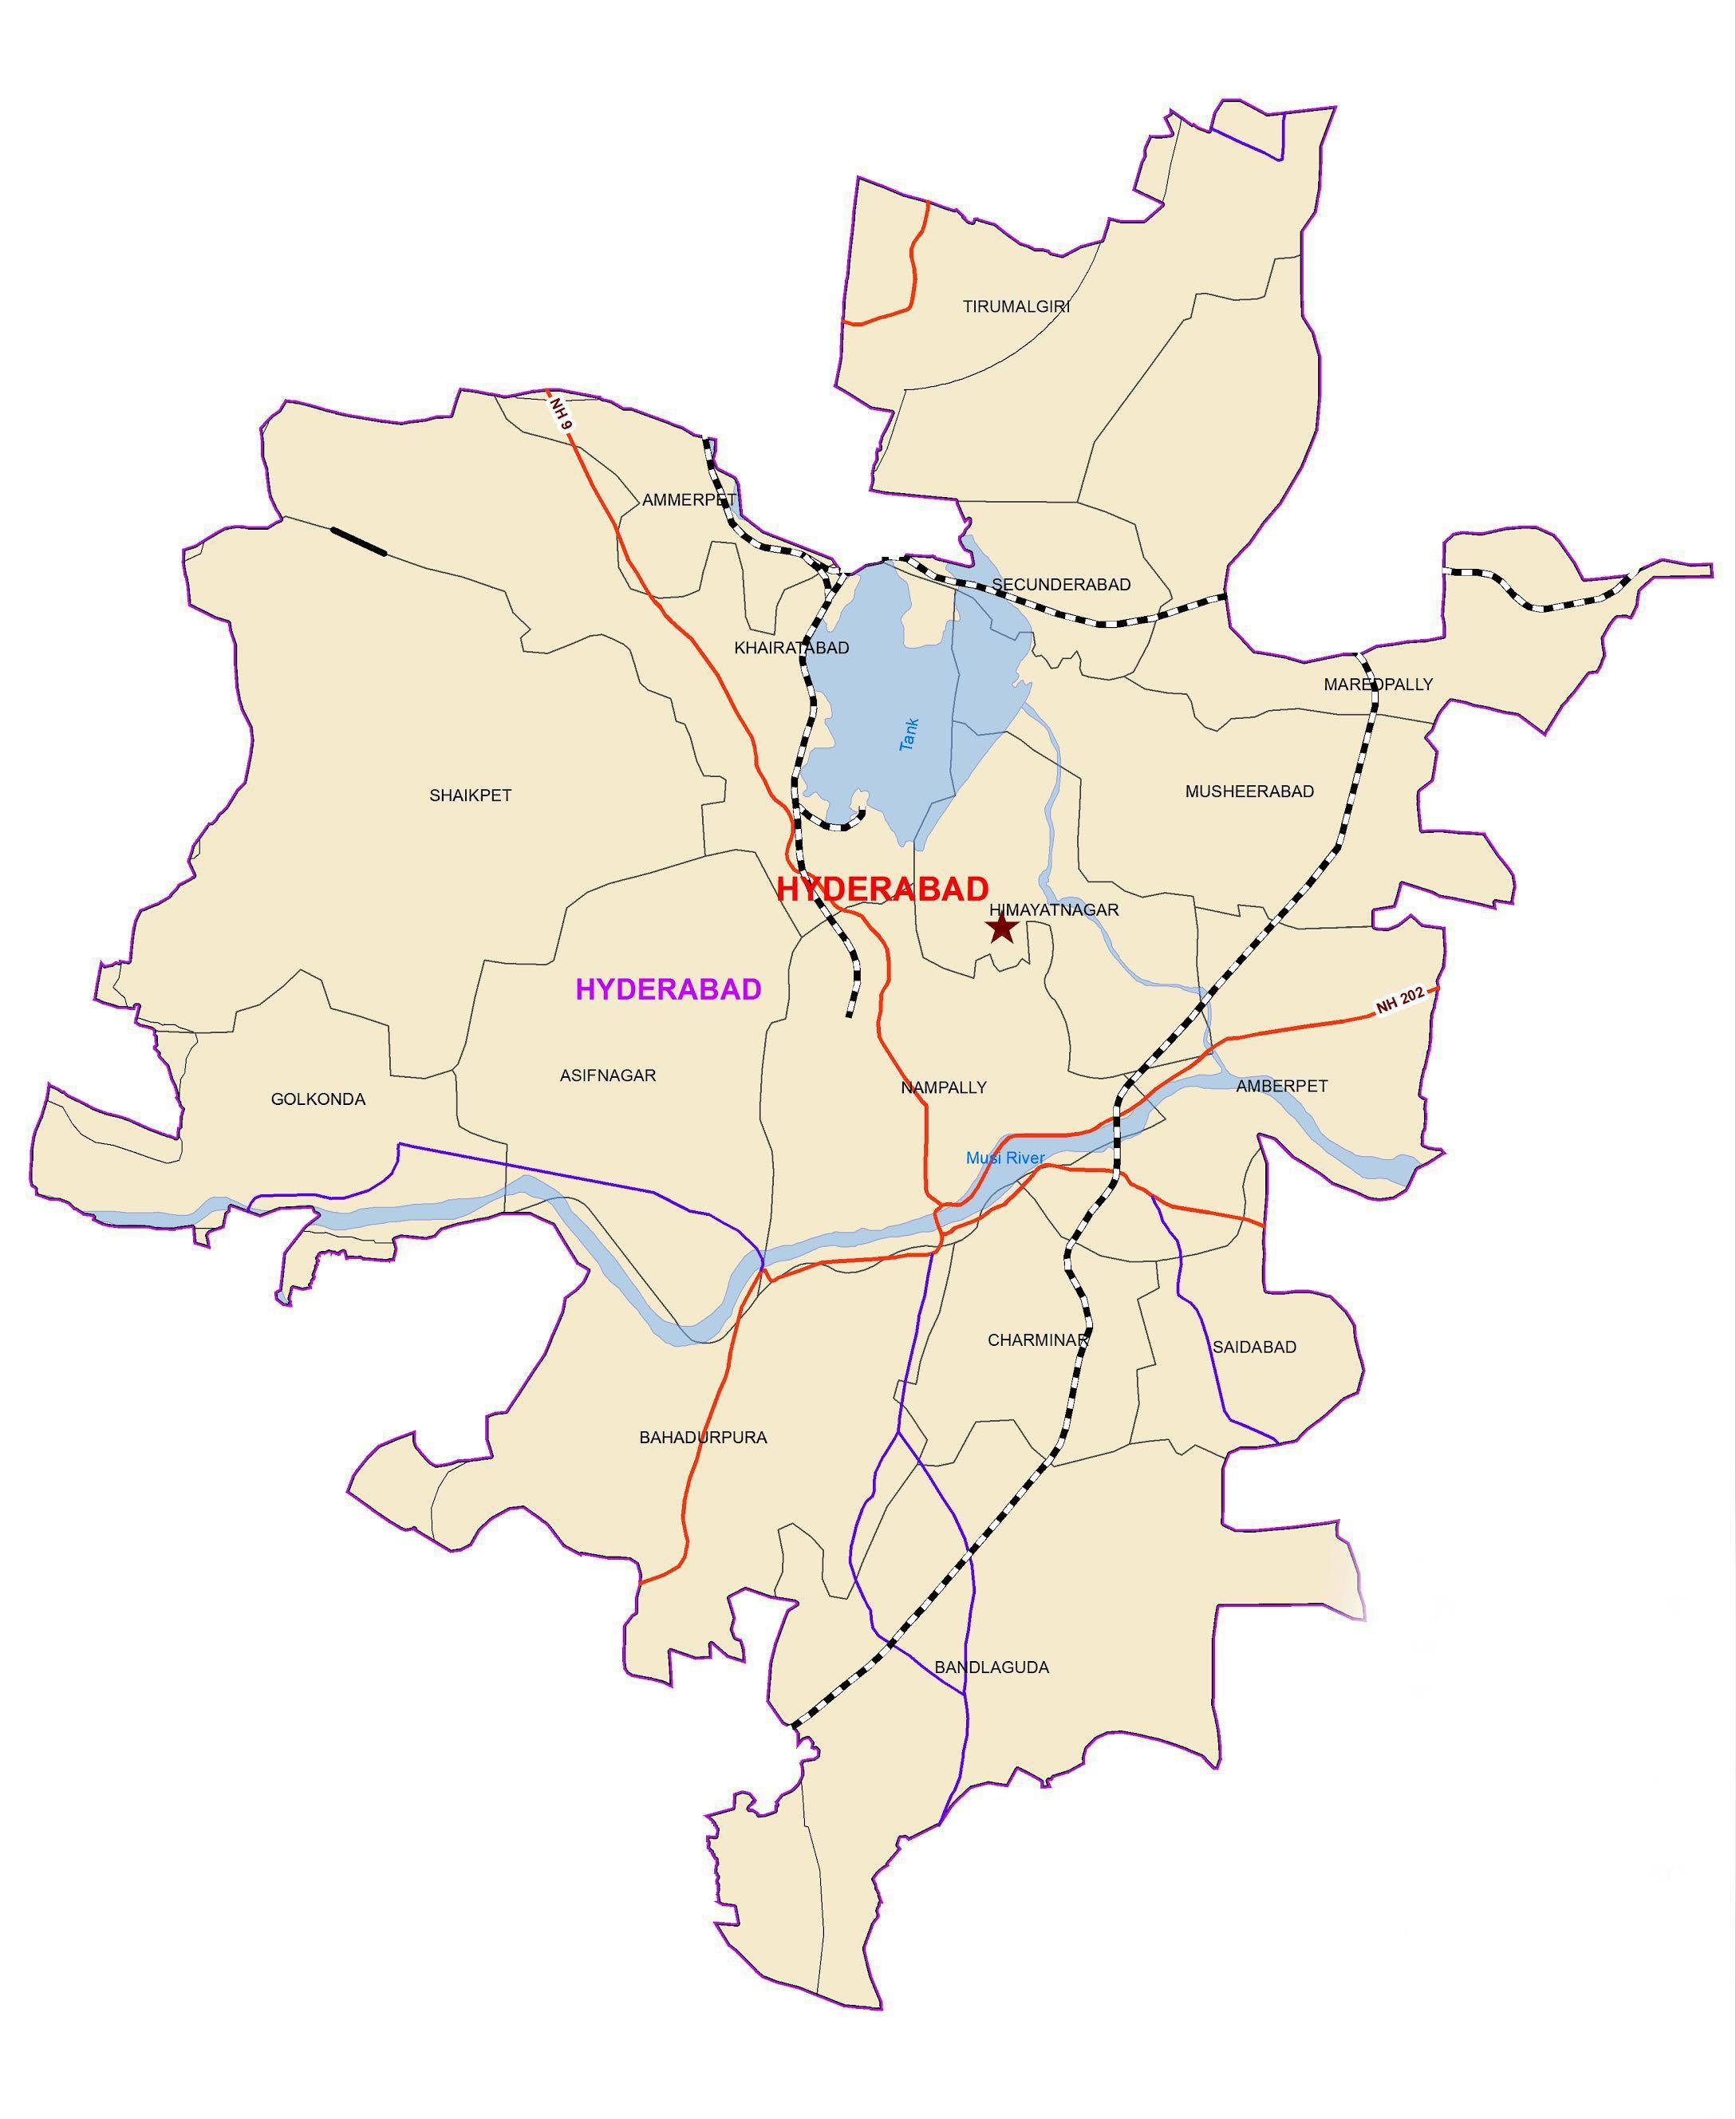 Hyderabad - Tecci.org on